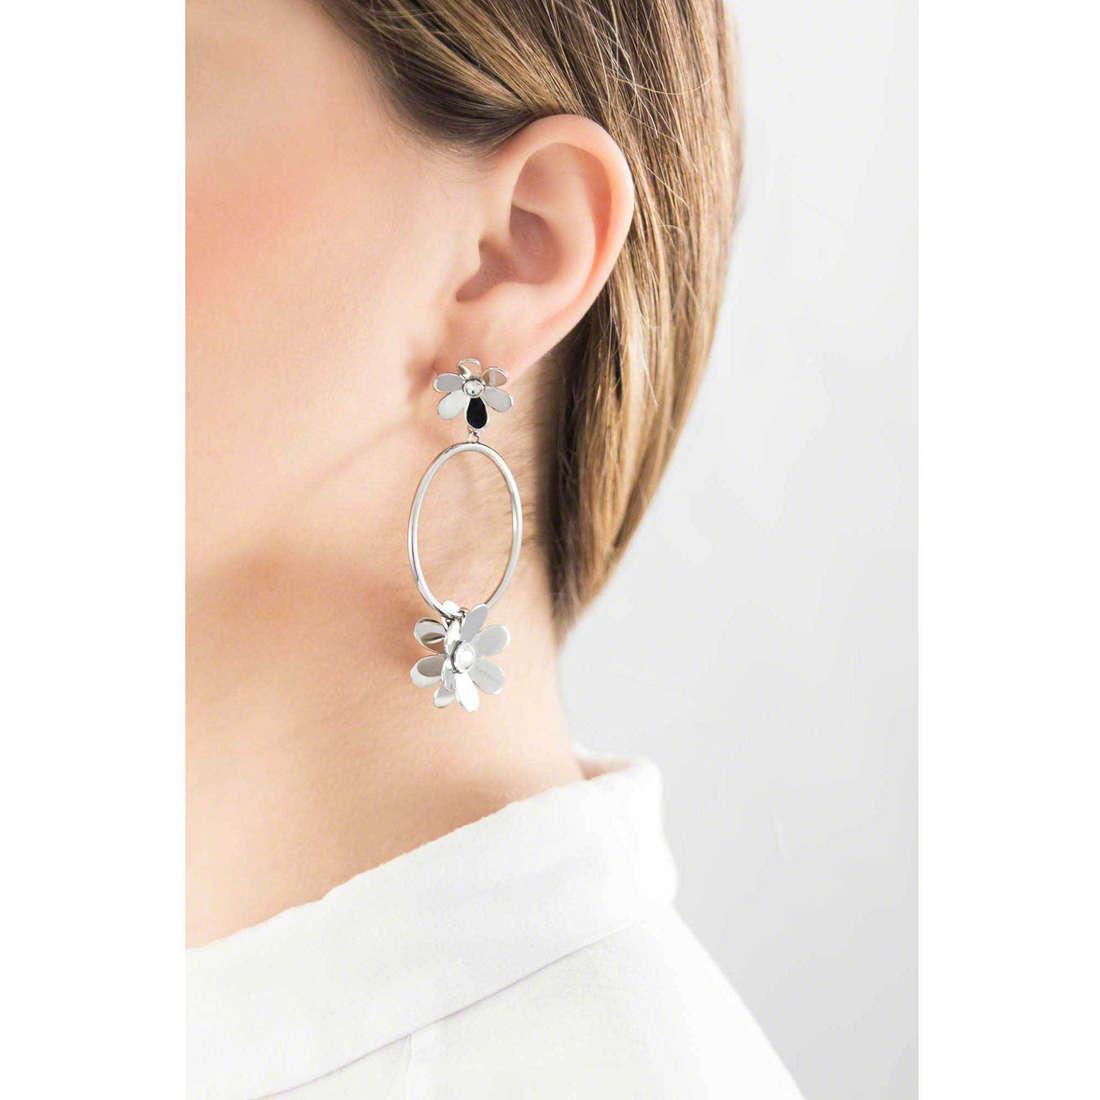 Brosway boucles d'oreille Jardin femme BJR21 indosso